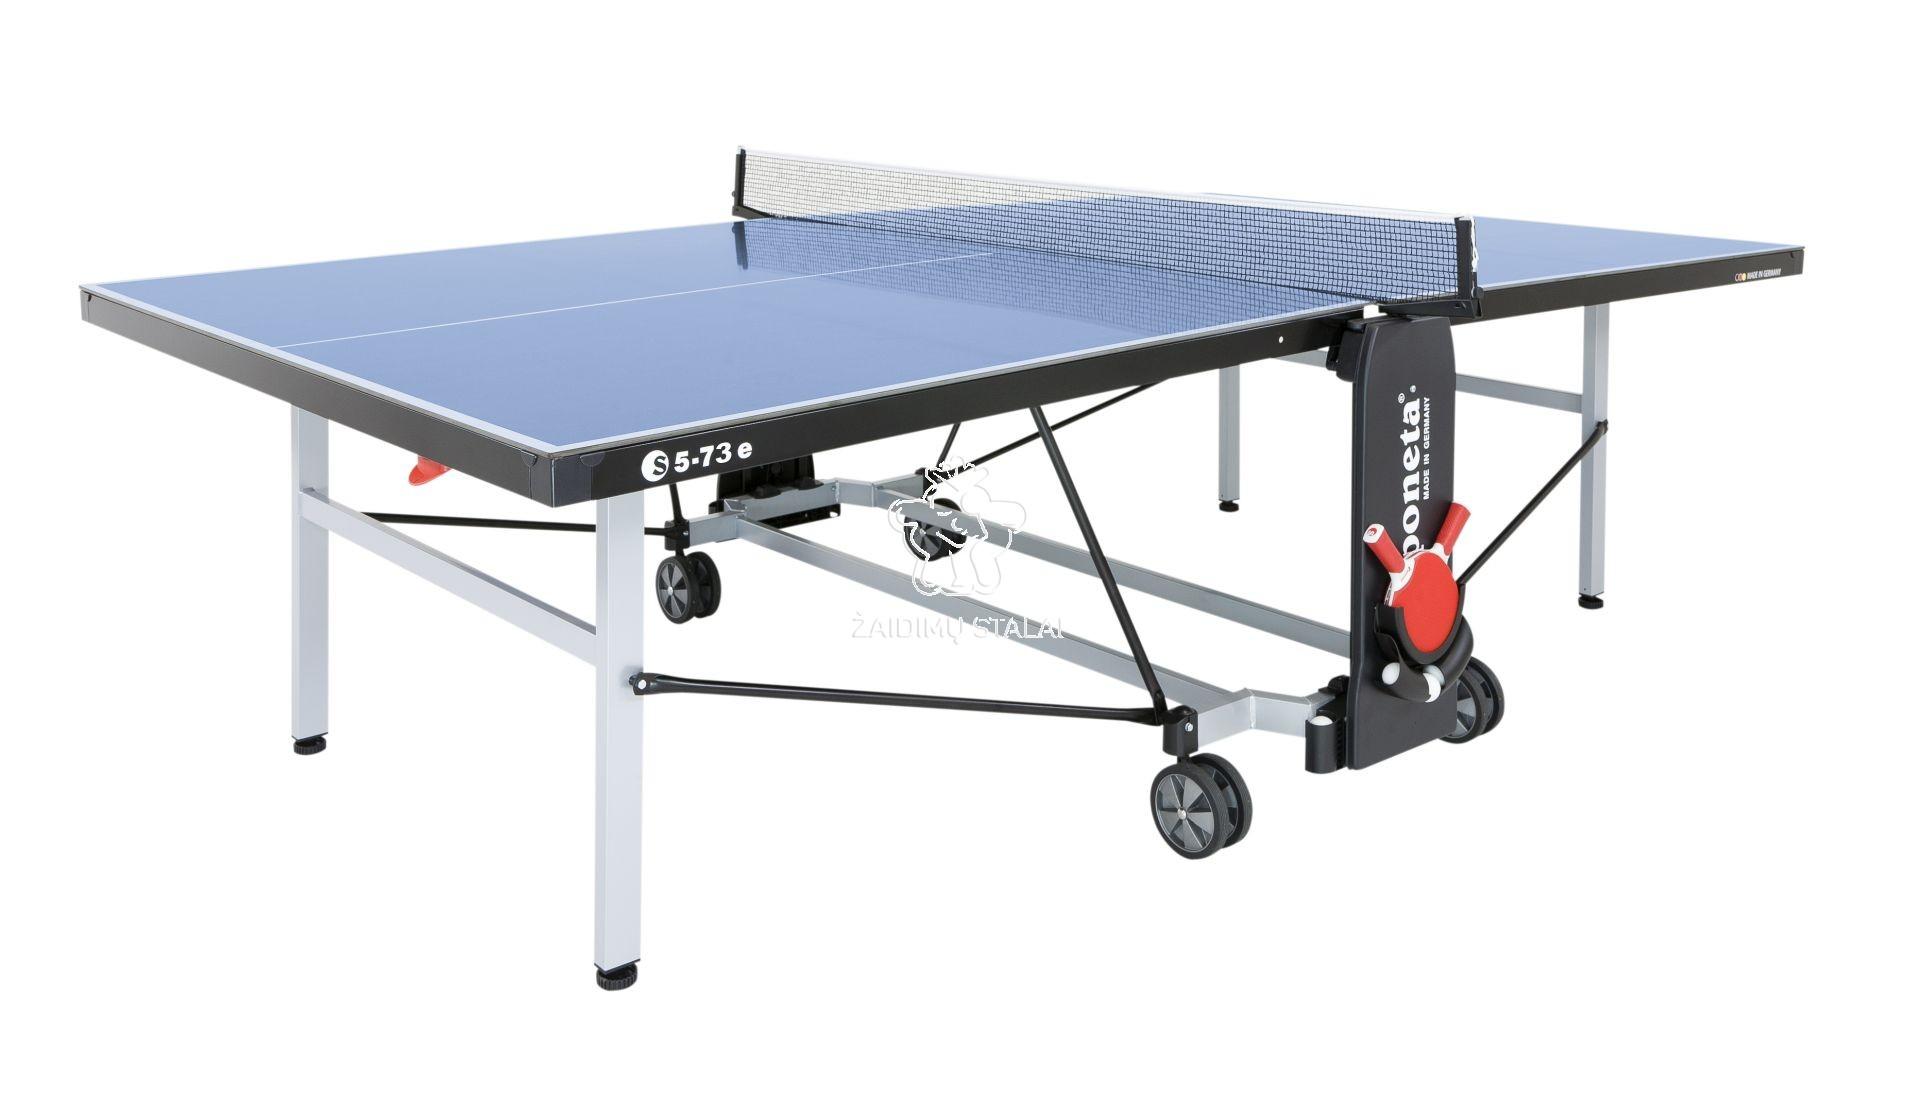 Stalo teniso stalas Sponeta S5-73e, mėlynas, 6mm melaminas lauko